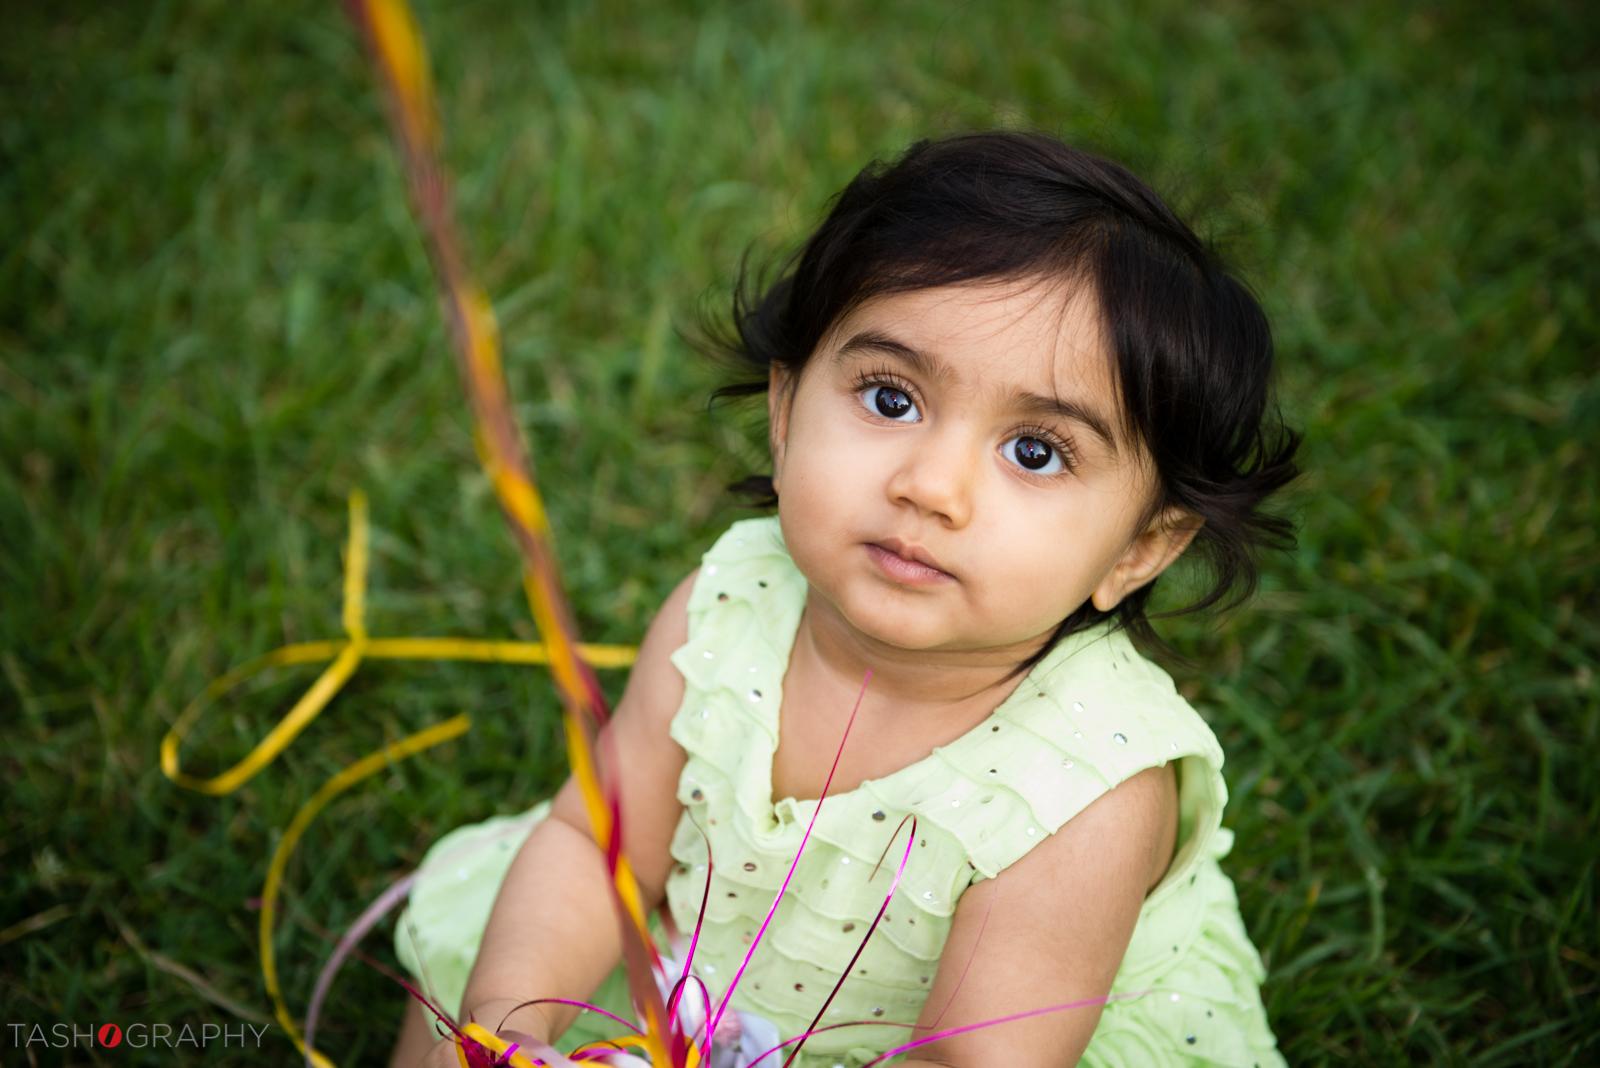 Aarohi-First-Bday-Web-31.jpg